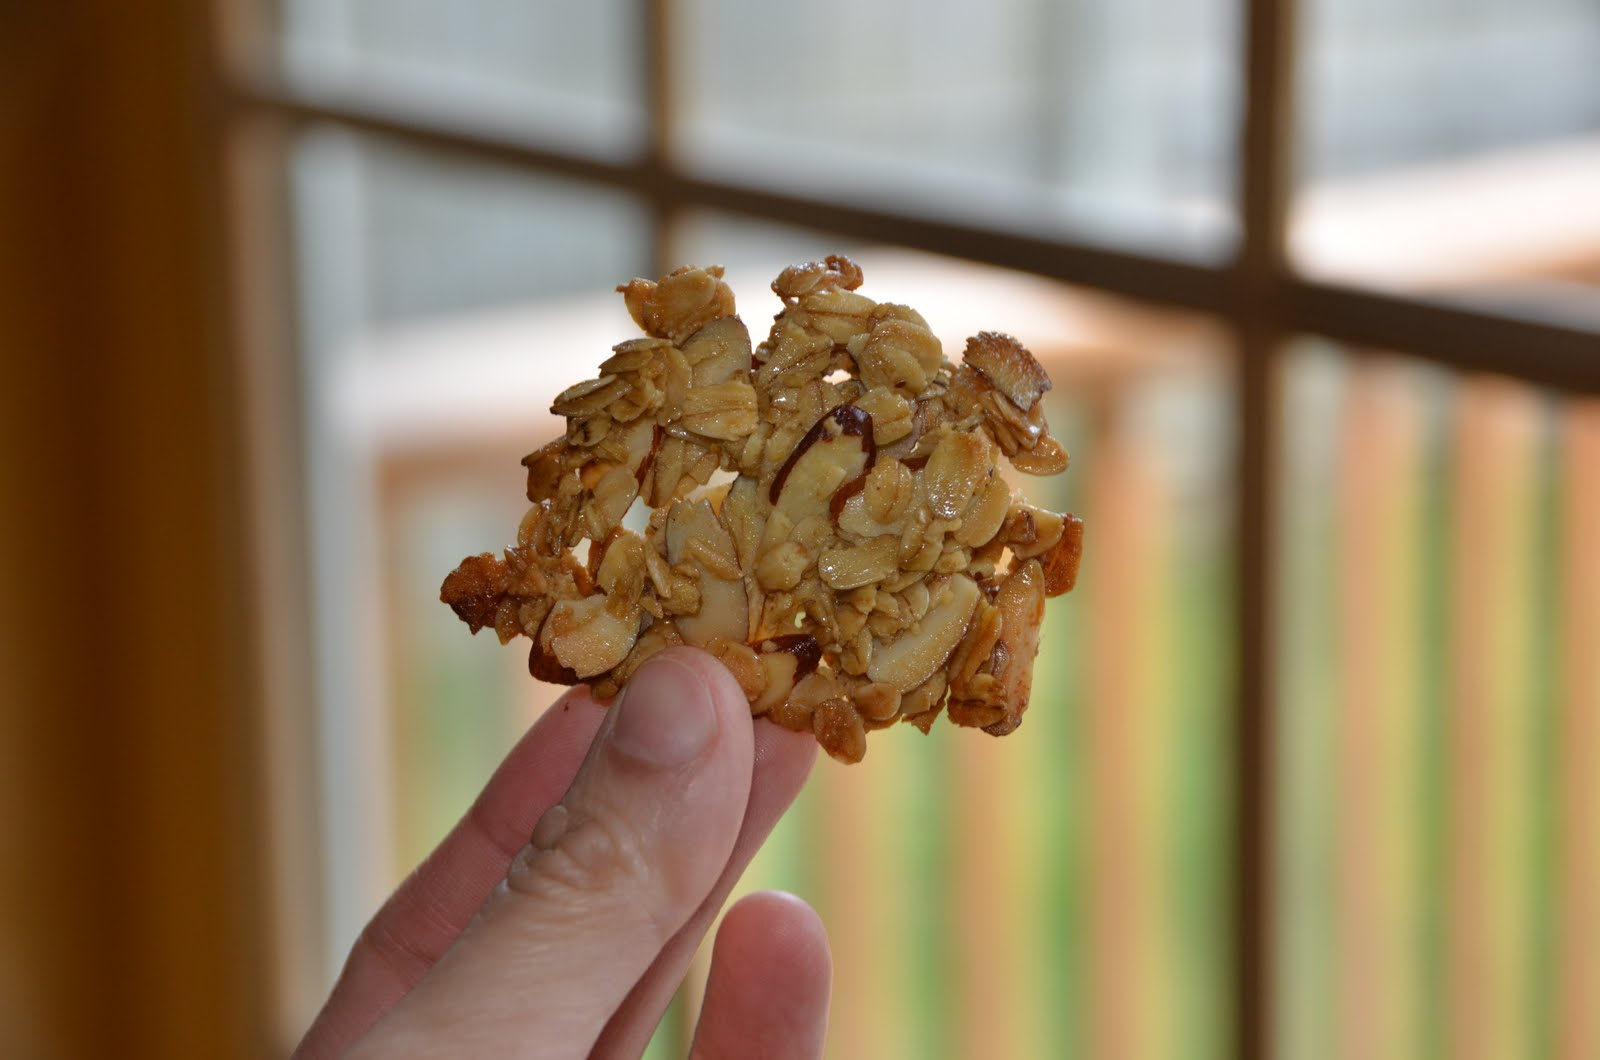 oatmeal-almond+crisps+%2810%29.JPG